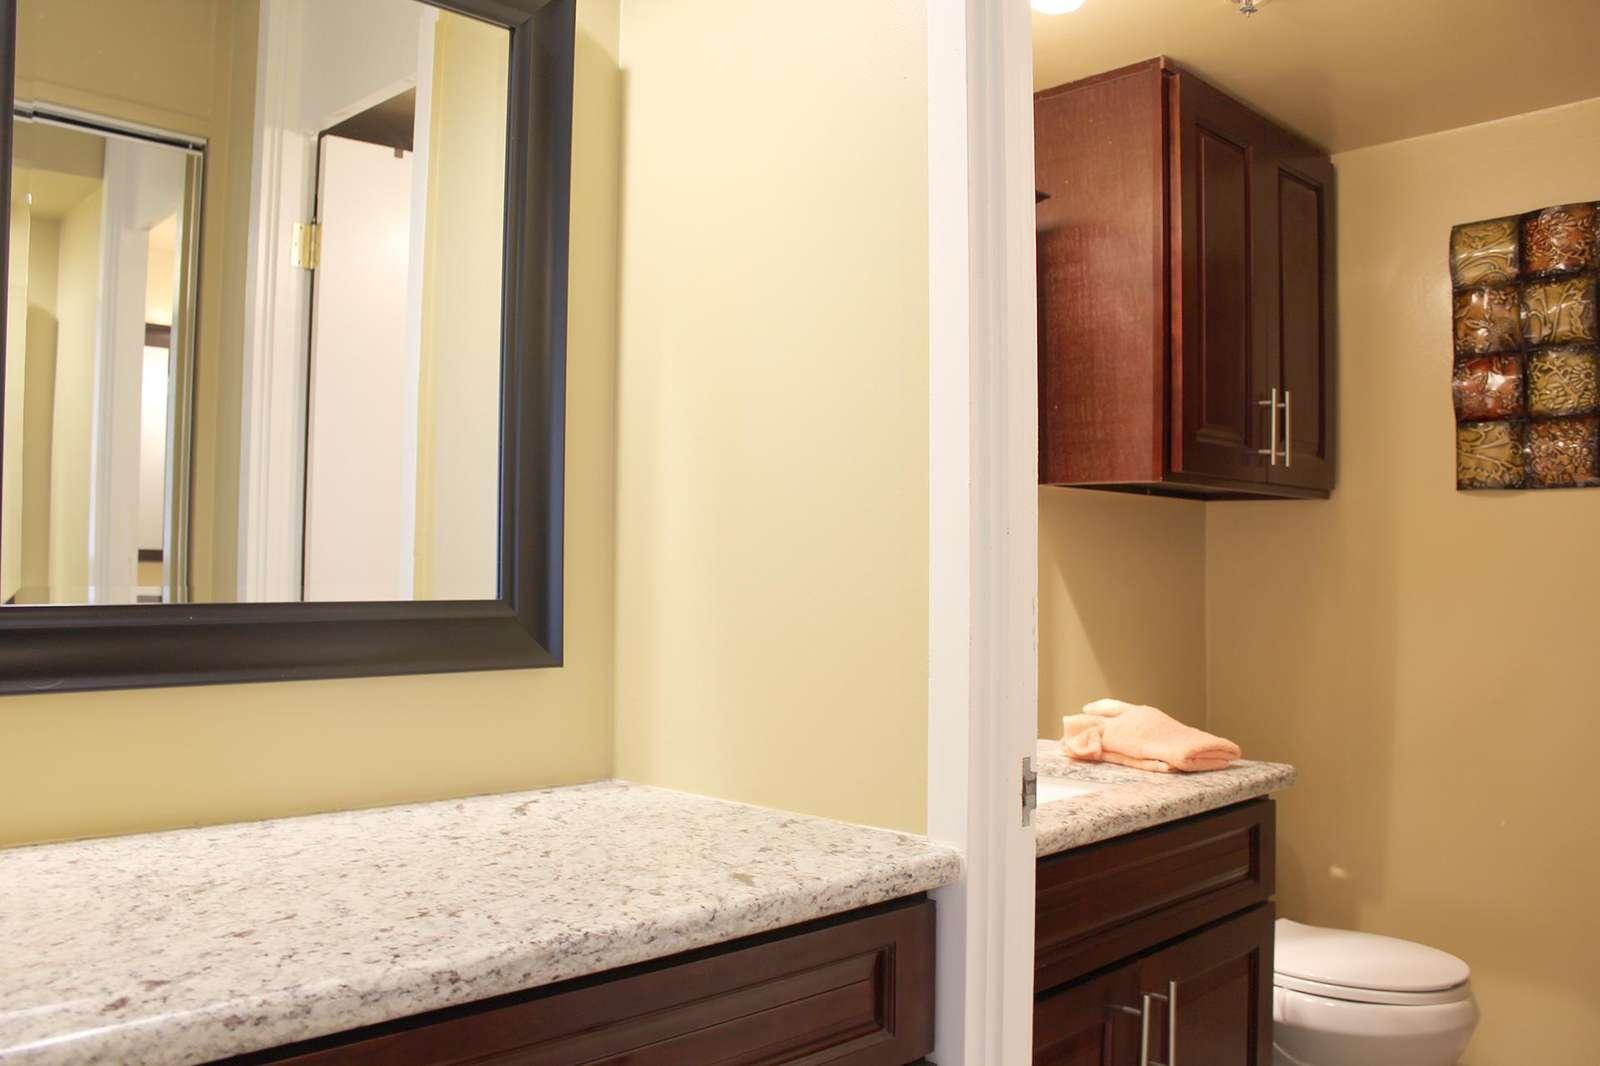 Vanity and Bathroom area